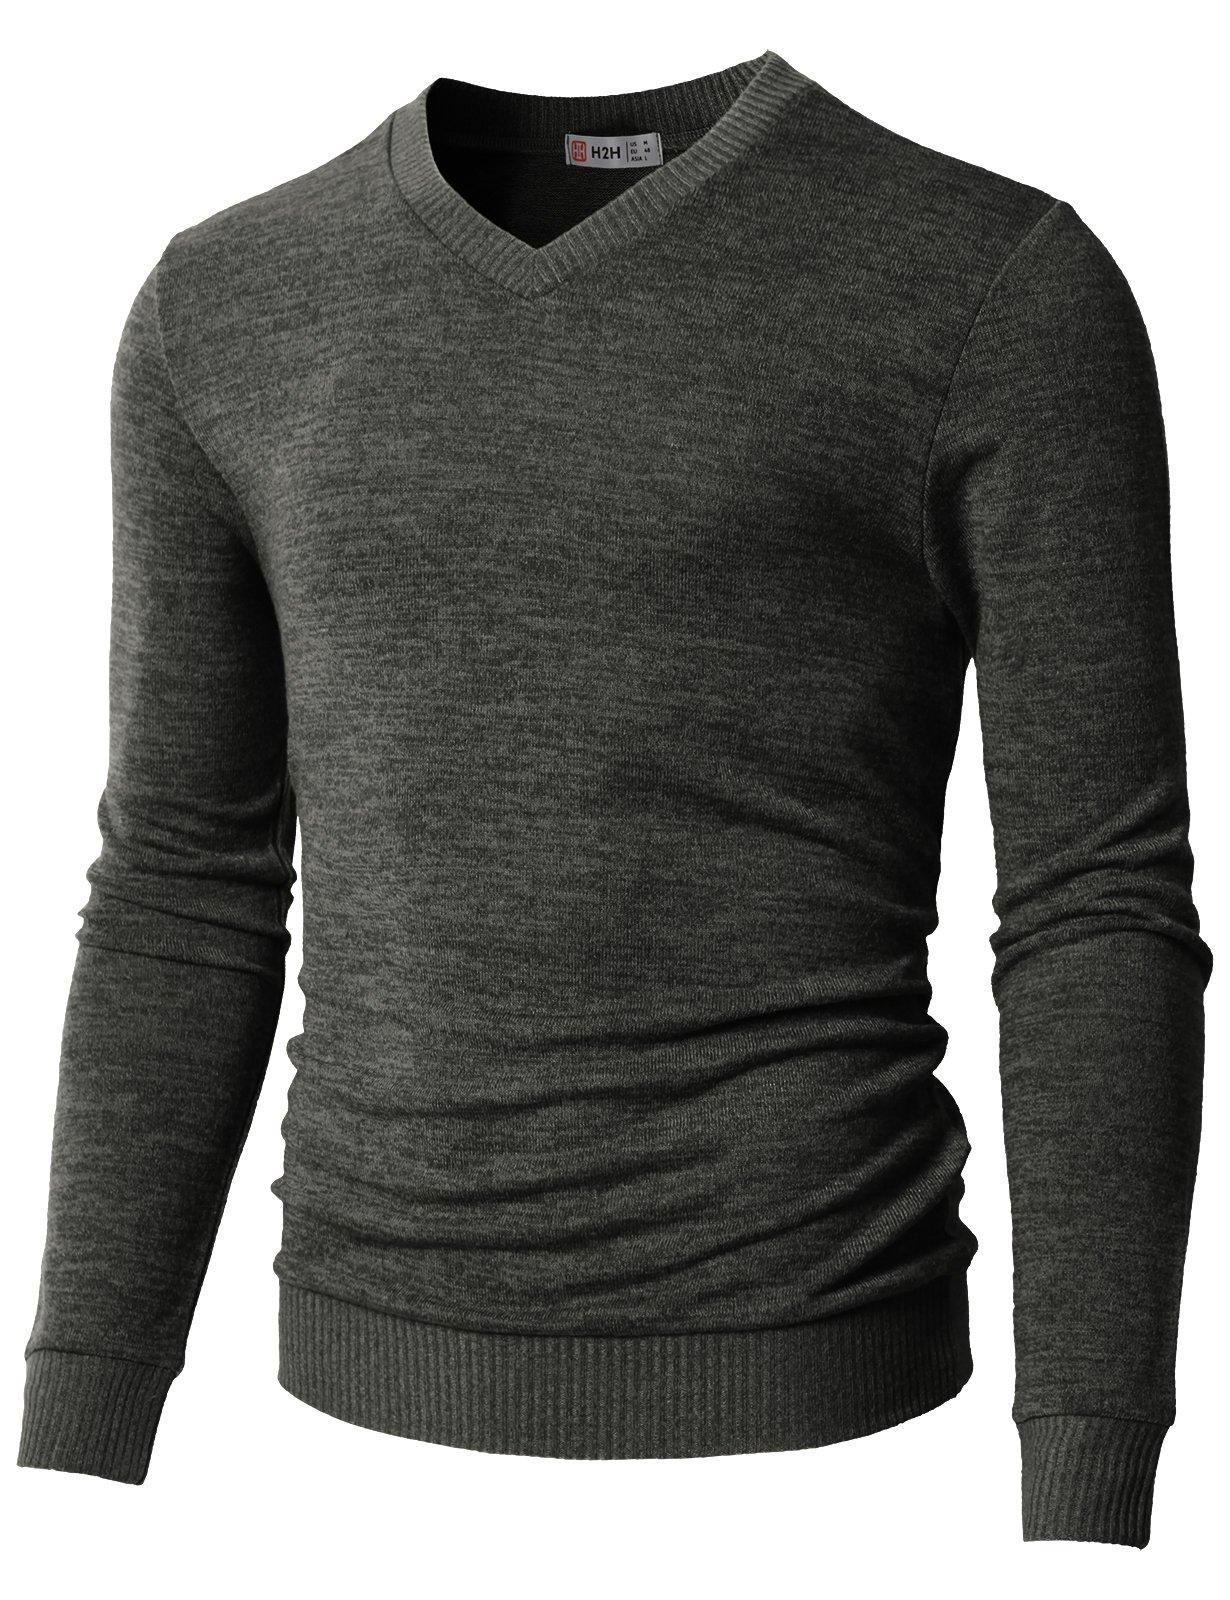 H2H Men's Quarter Zip Marled Sweater Charcoal US M/Asia L (CMOSWL018)